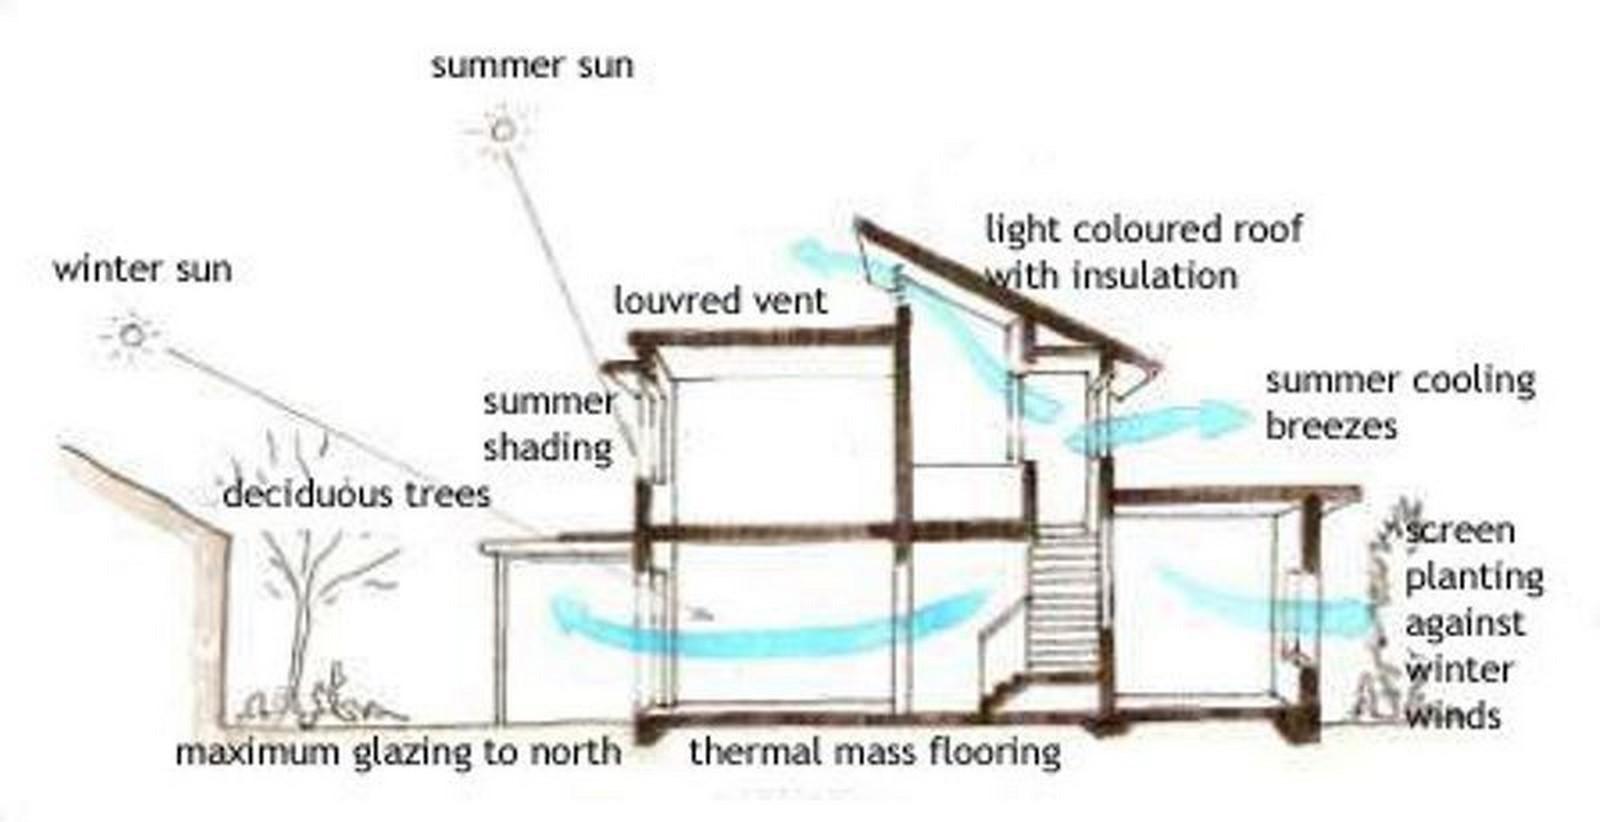 Constructional Elements- Sheet3